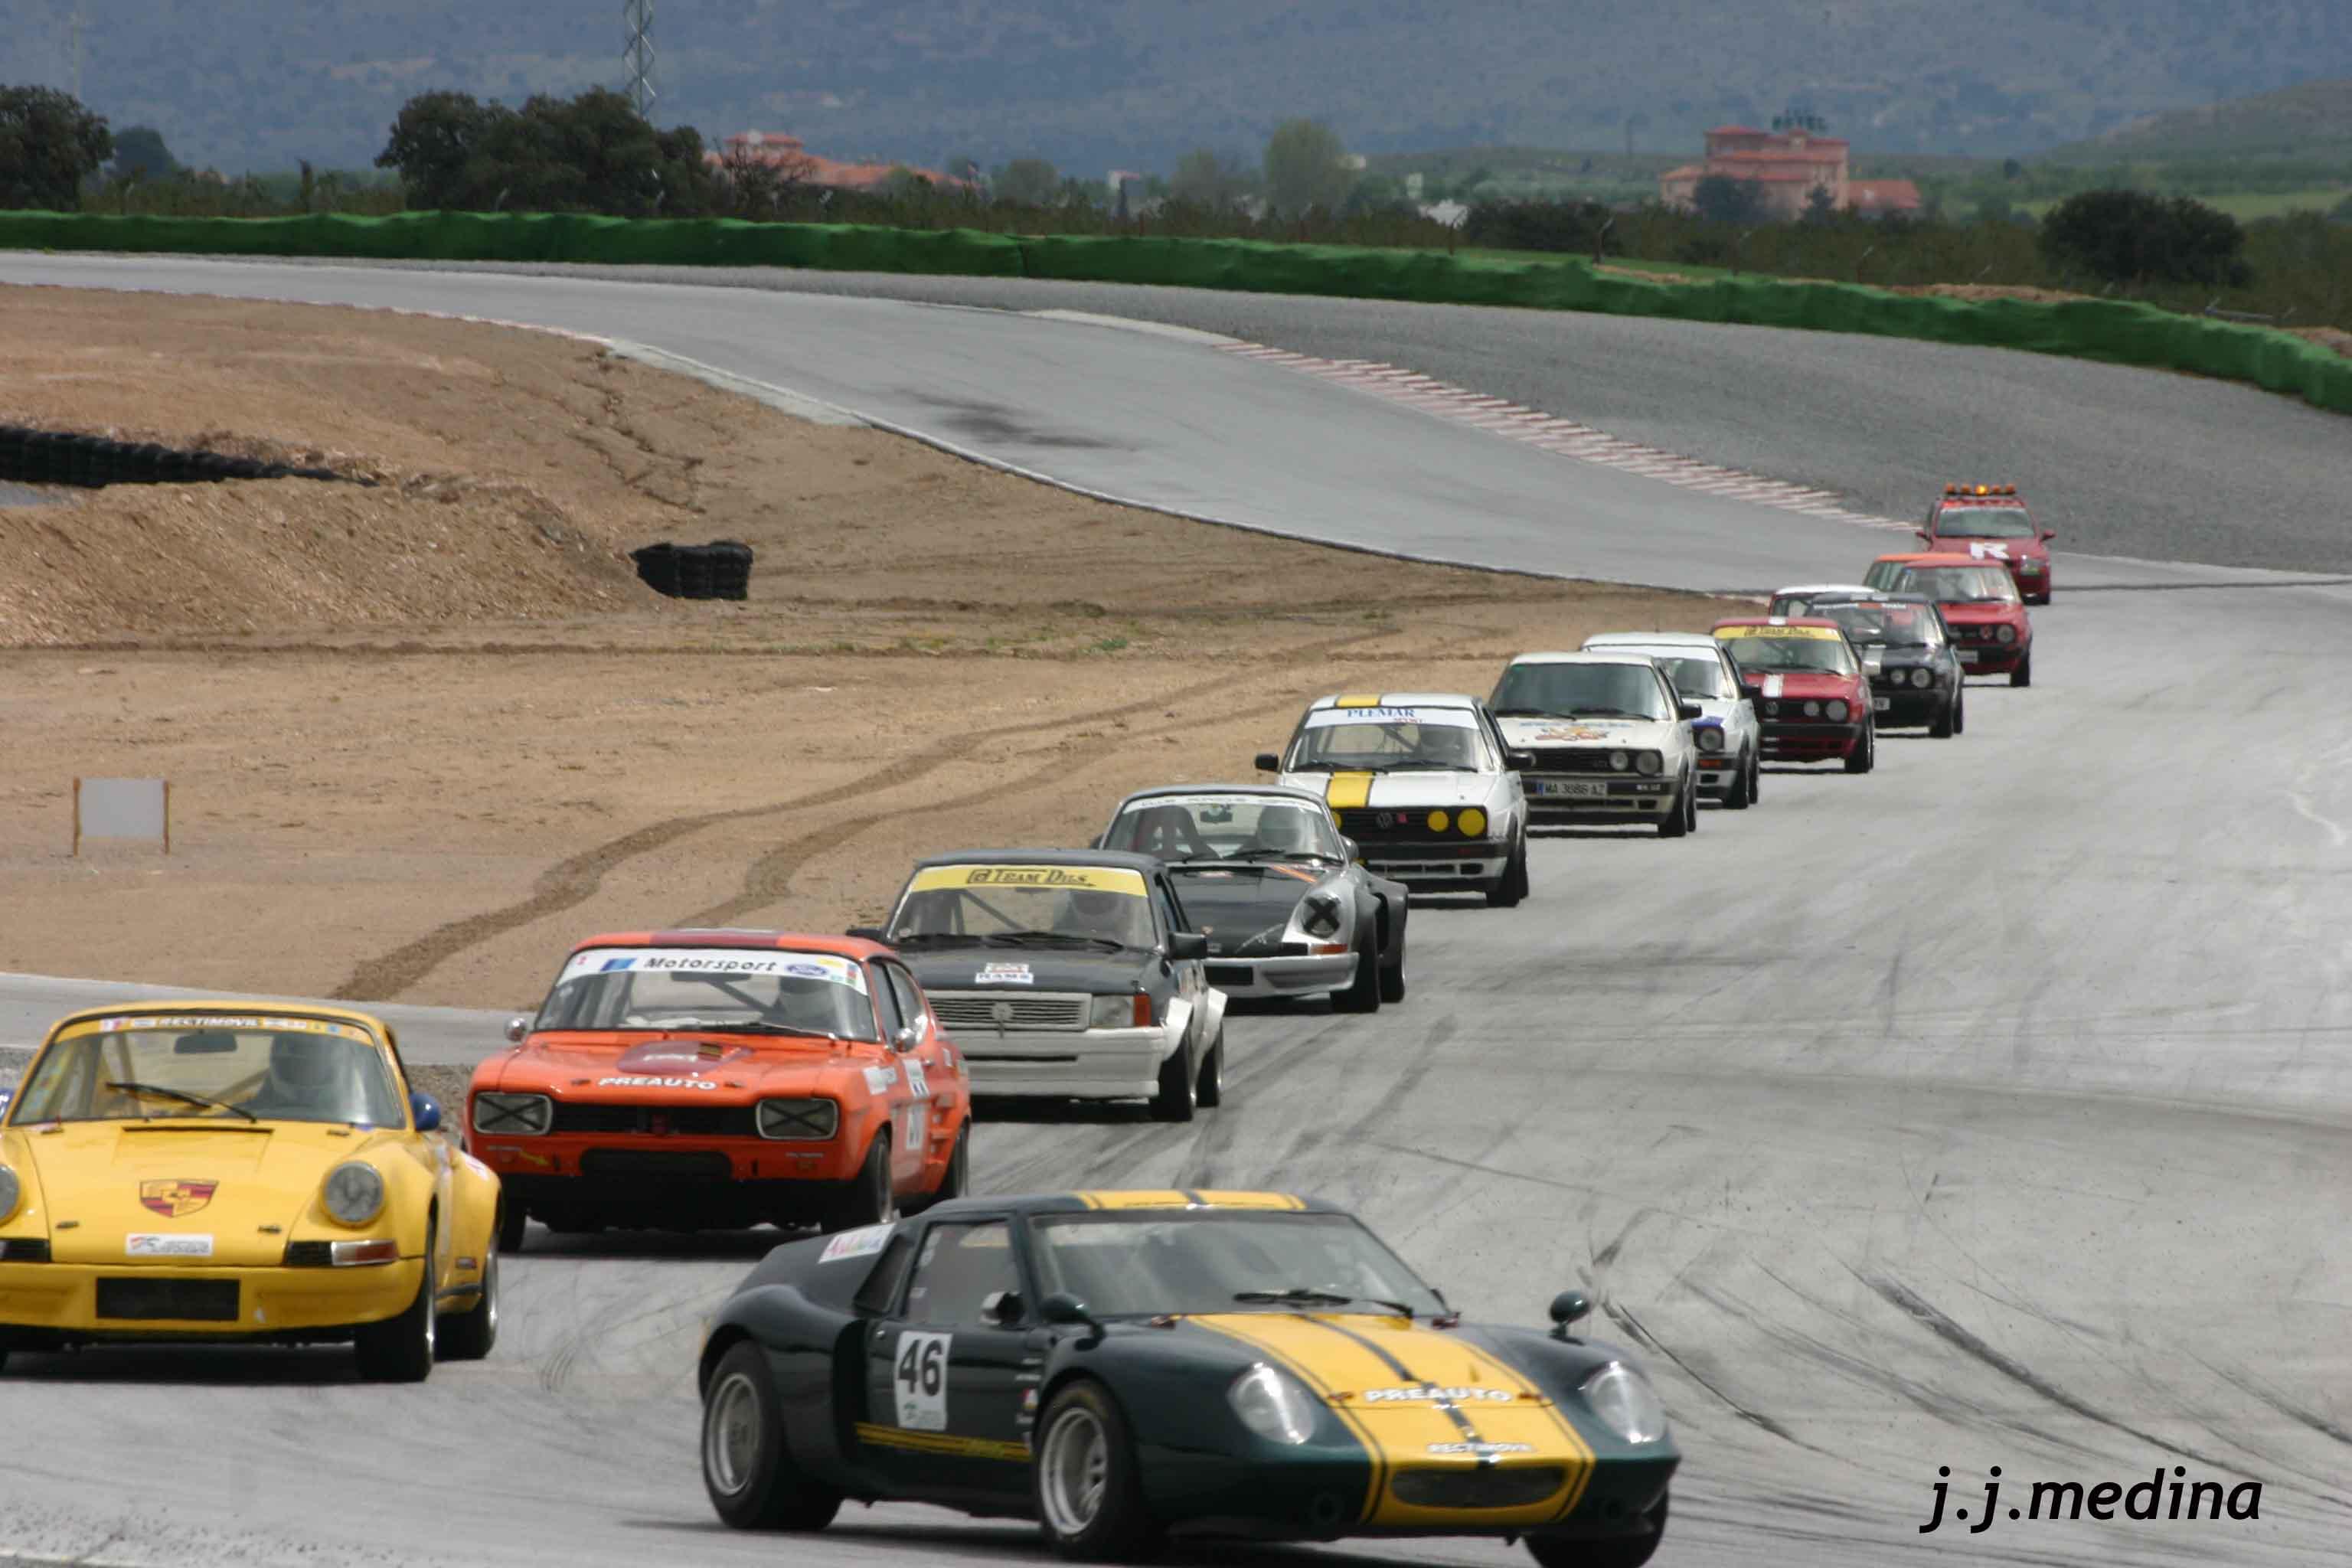 Circuito Guadix : Circuito de guadix la página motor jjmedina